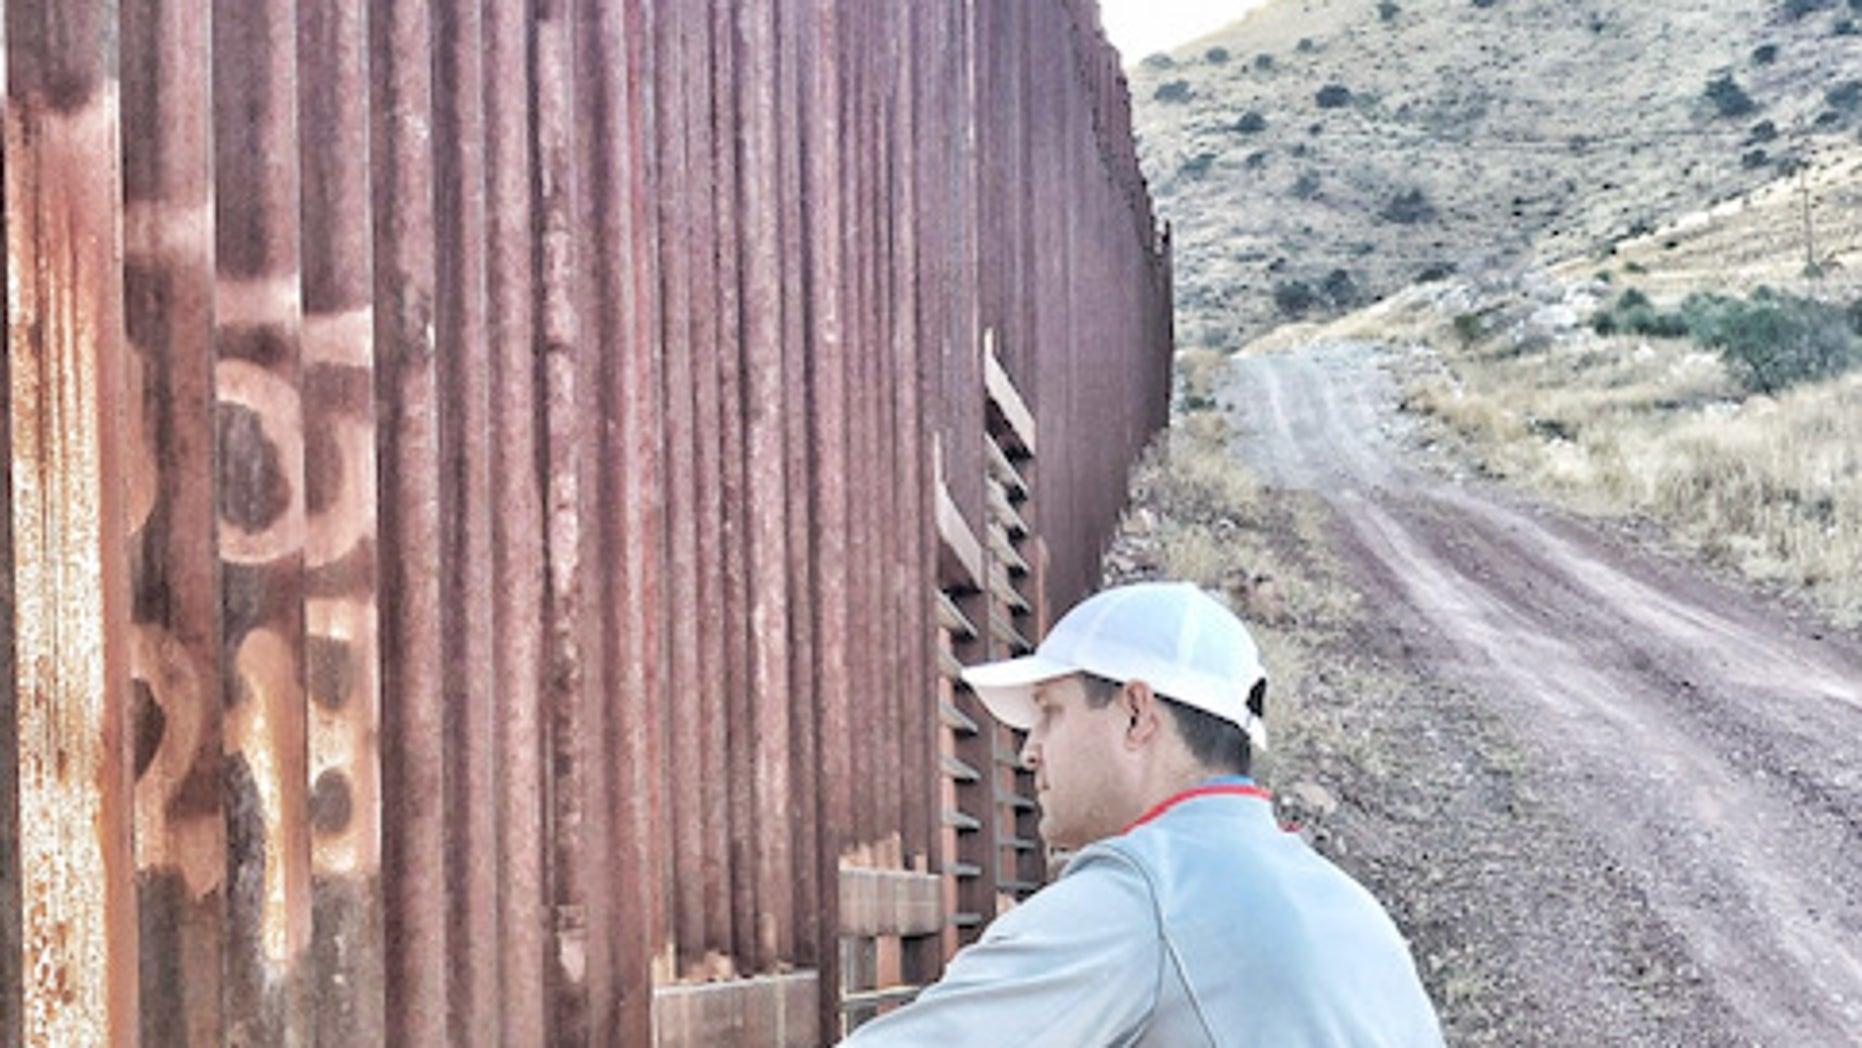 Brian Kolfage on a visit to the Arizona-Mexico border last month.